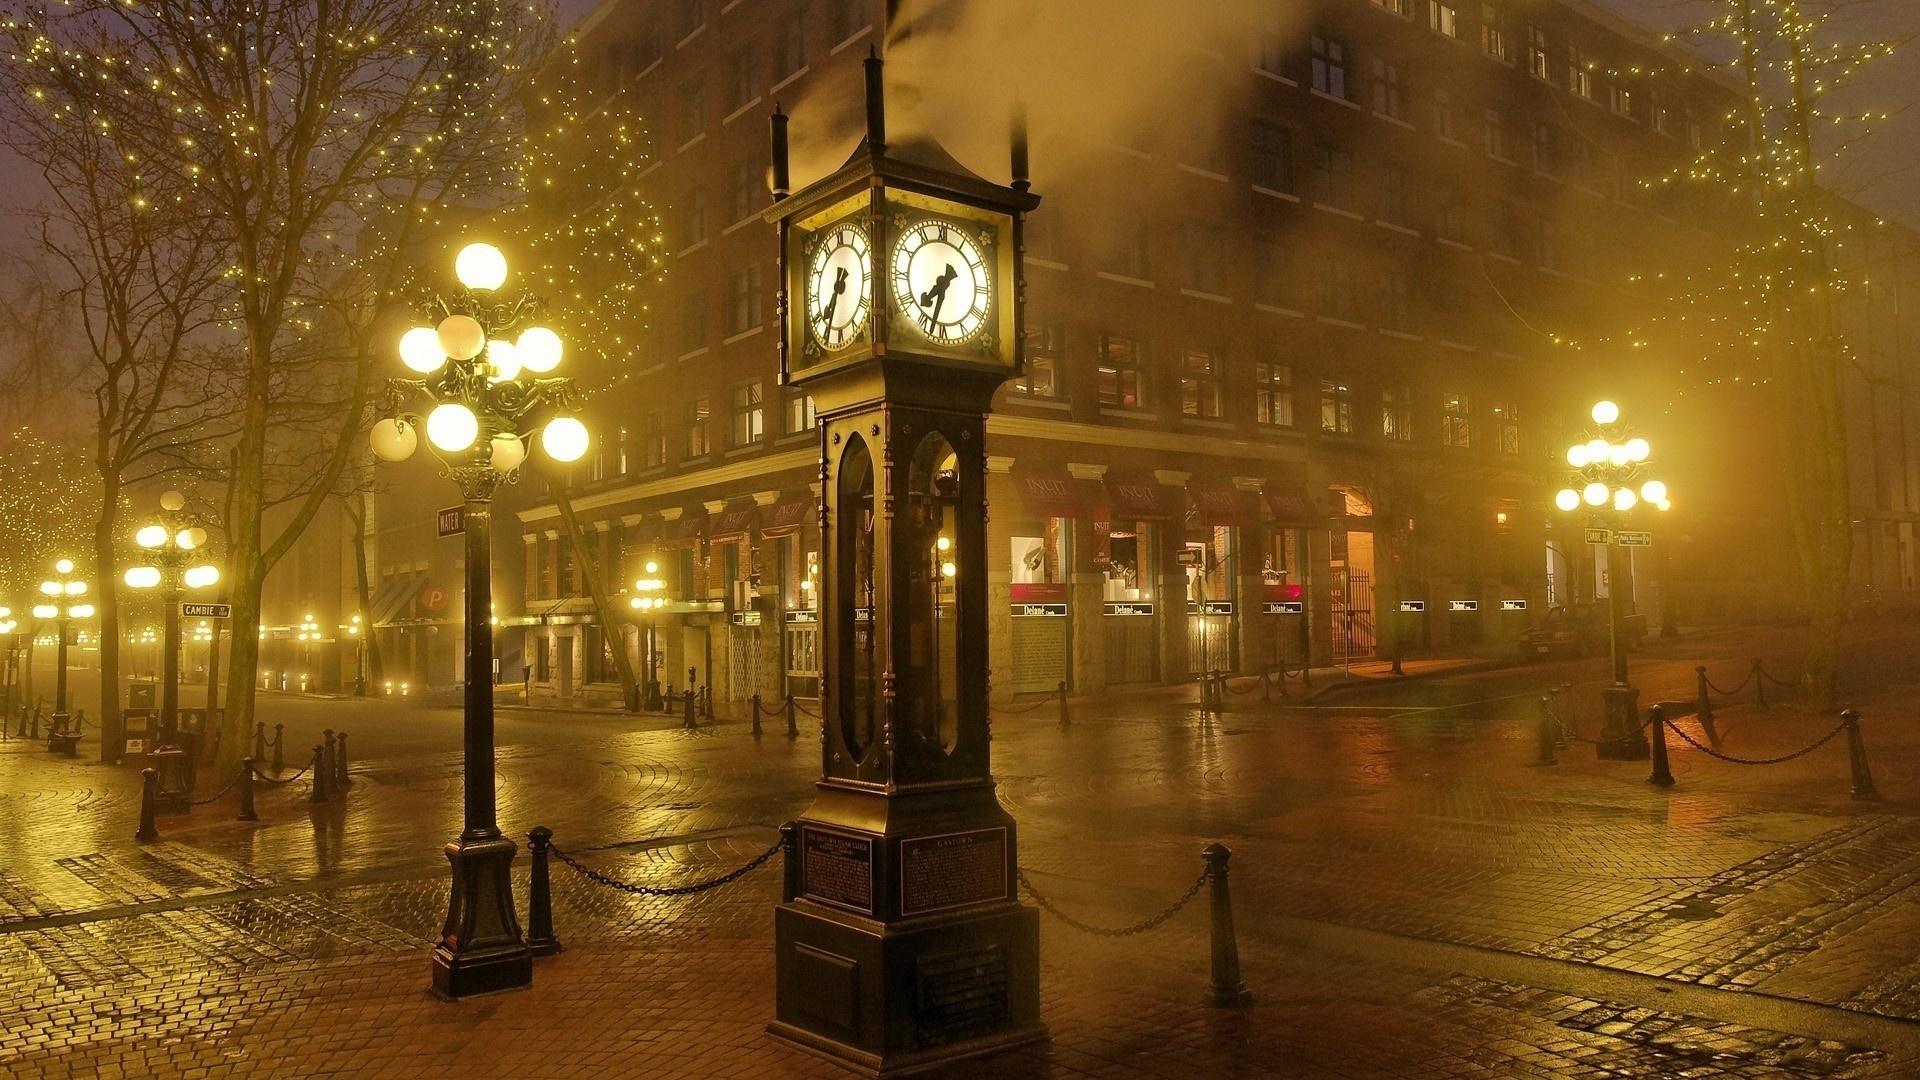 Download Wallpaper 1920x1080 Hours Night Lights Light Street